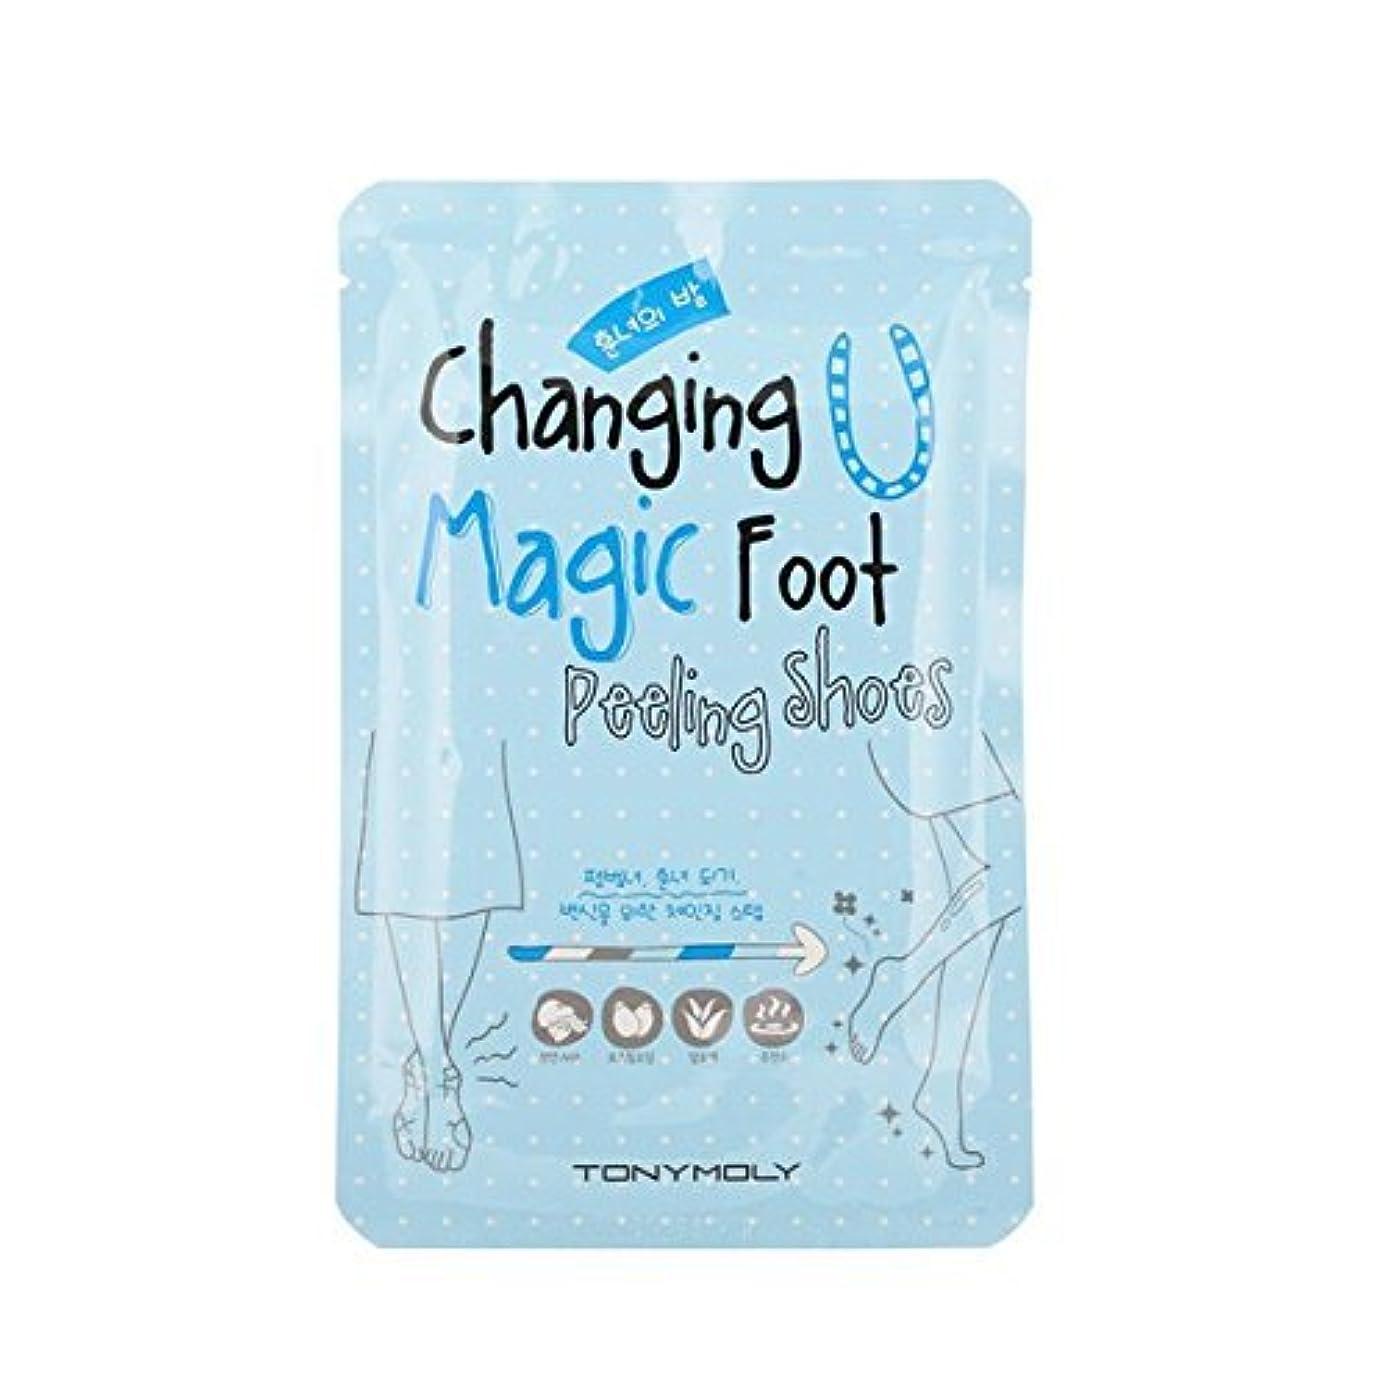 TONYMOLY Changing U Magic Foot Peeling Shoes (並行輸入品)